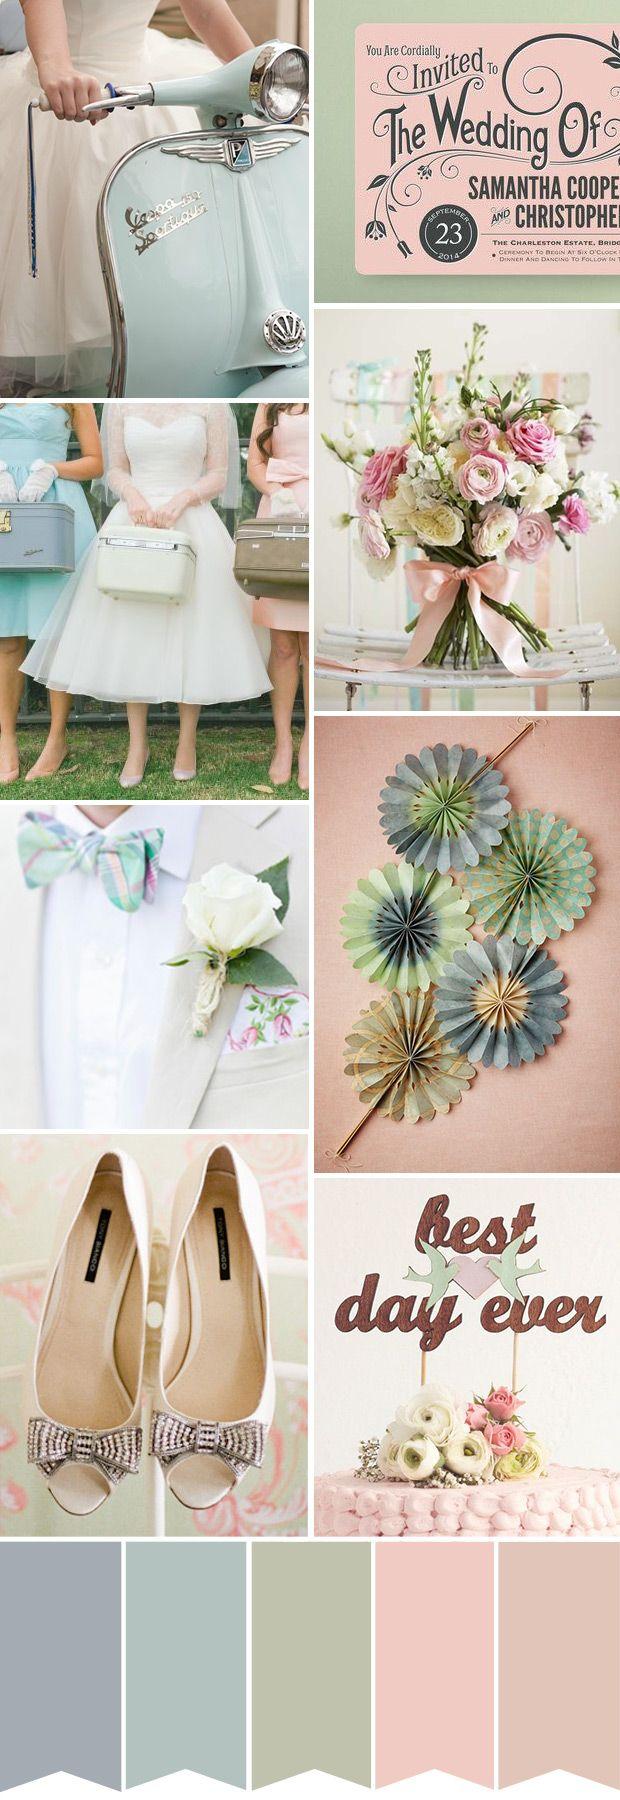 retro pastels wedding inspiration   onefabday.com